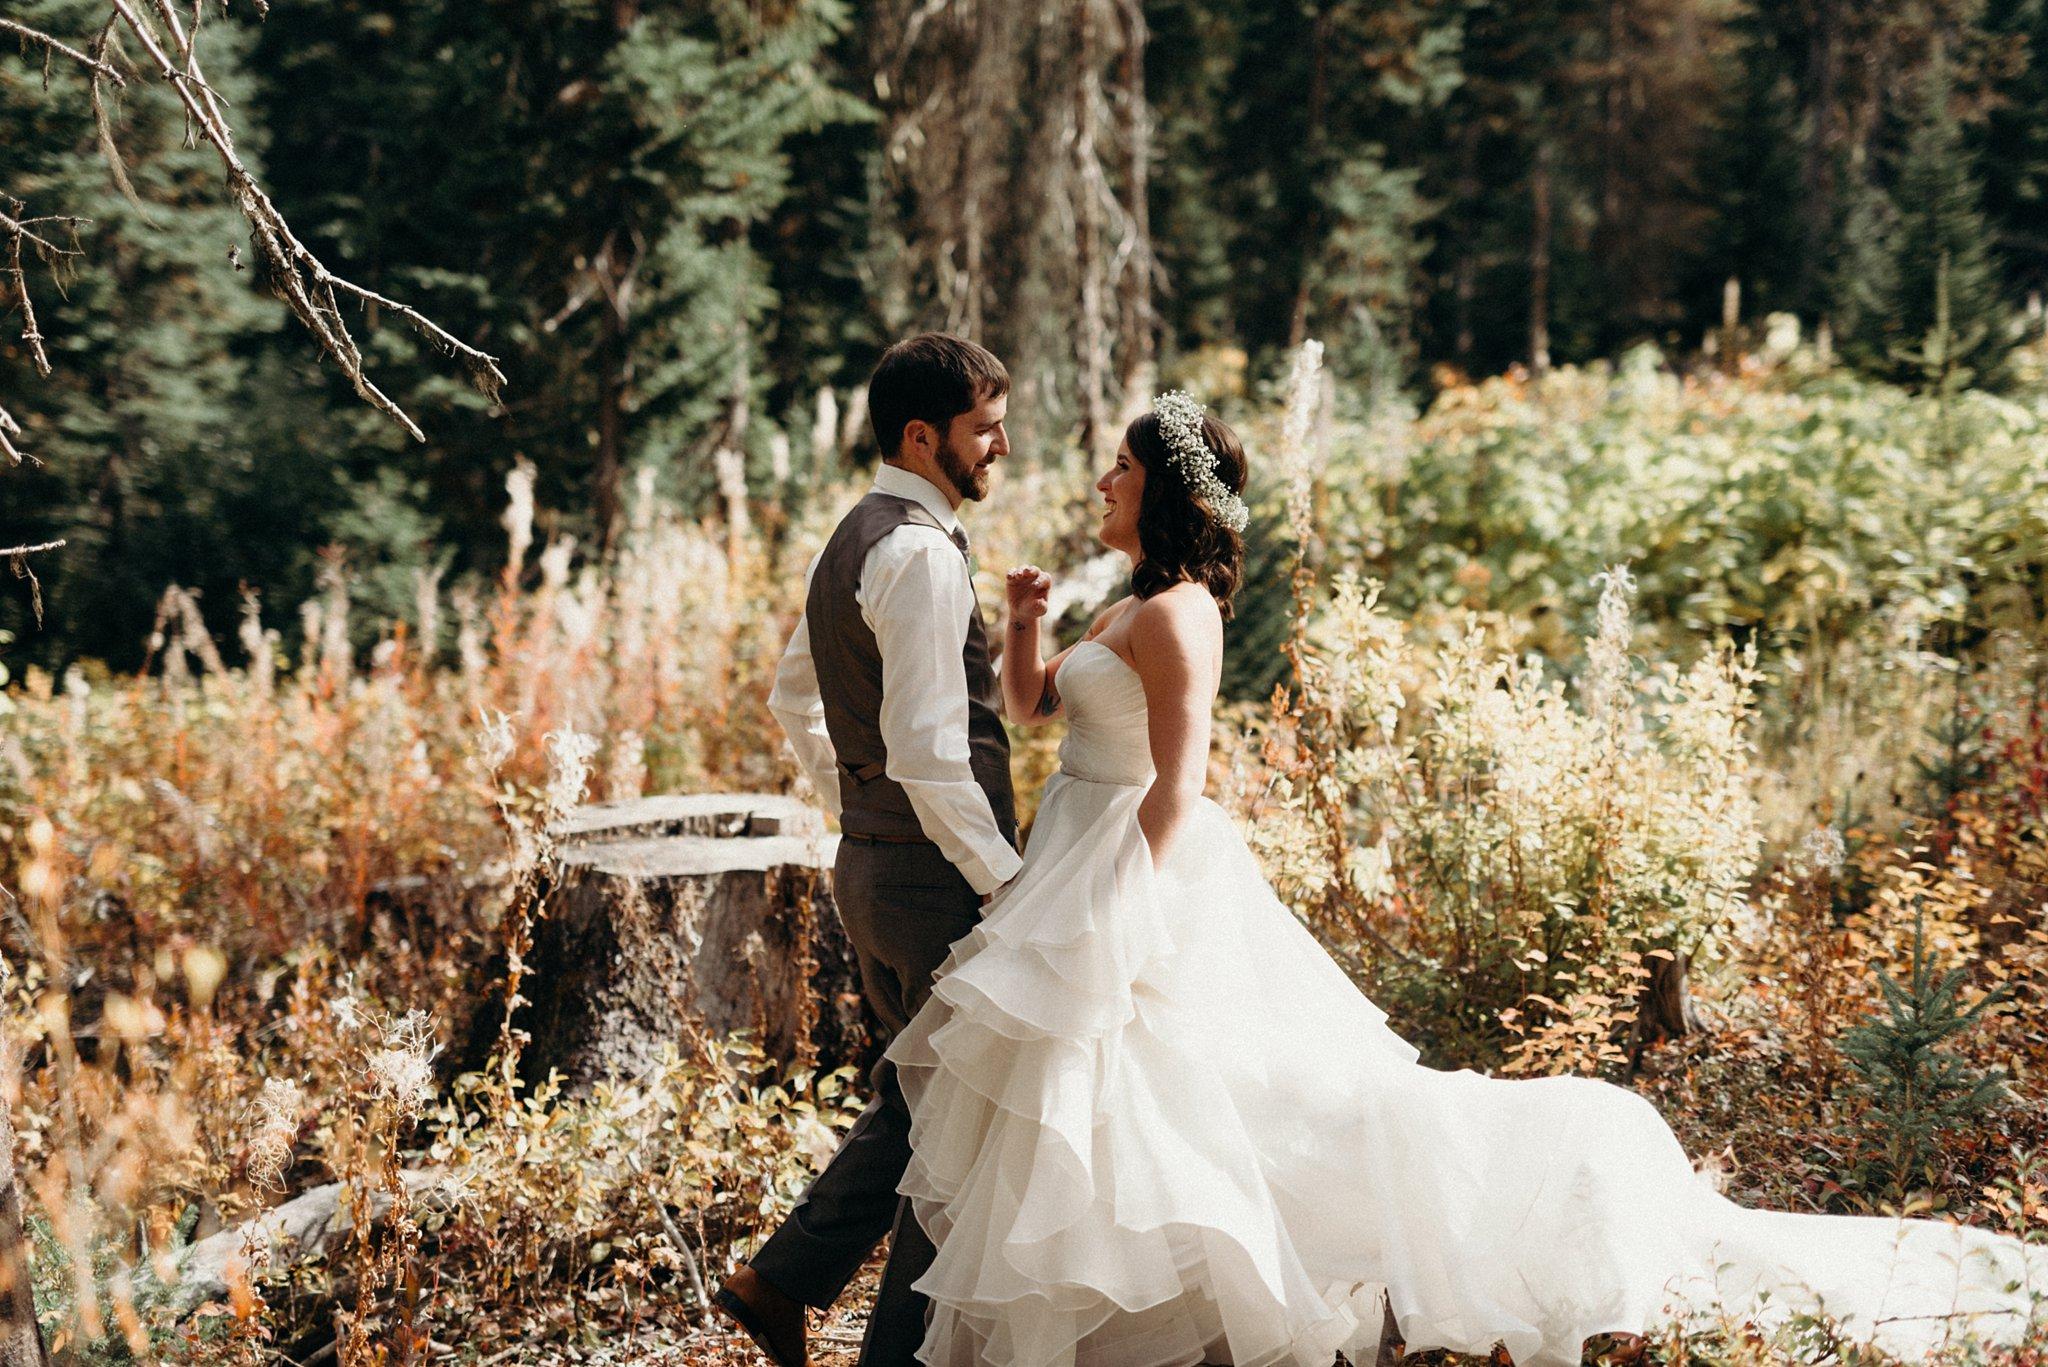 kaihla_tonai_intimate_wedding_elopement_photographer_6884.jpg